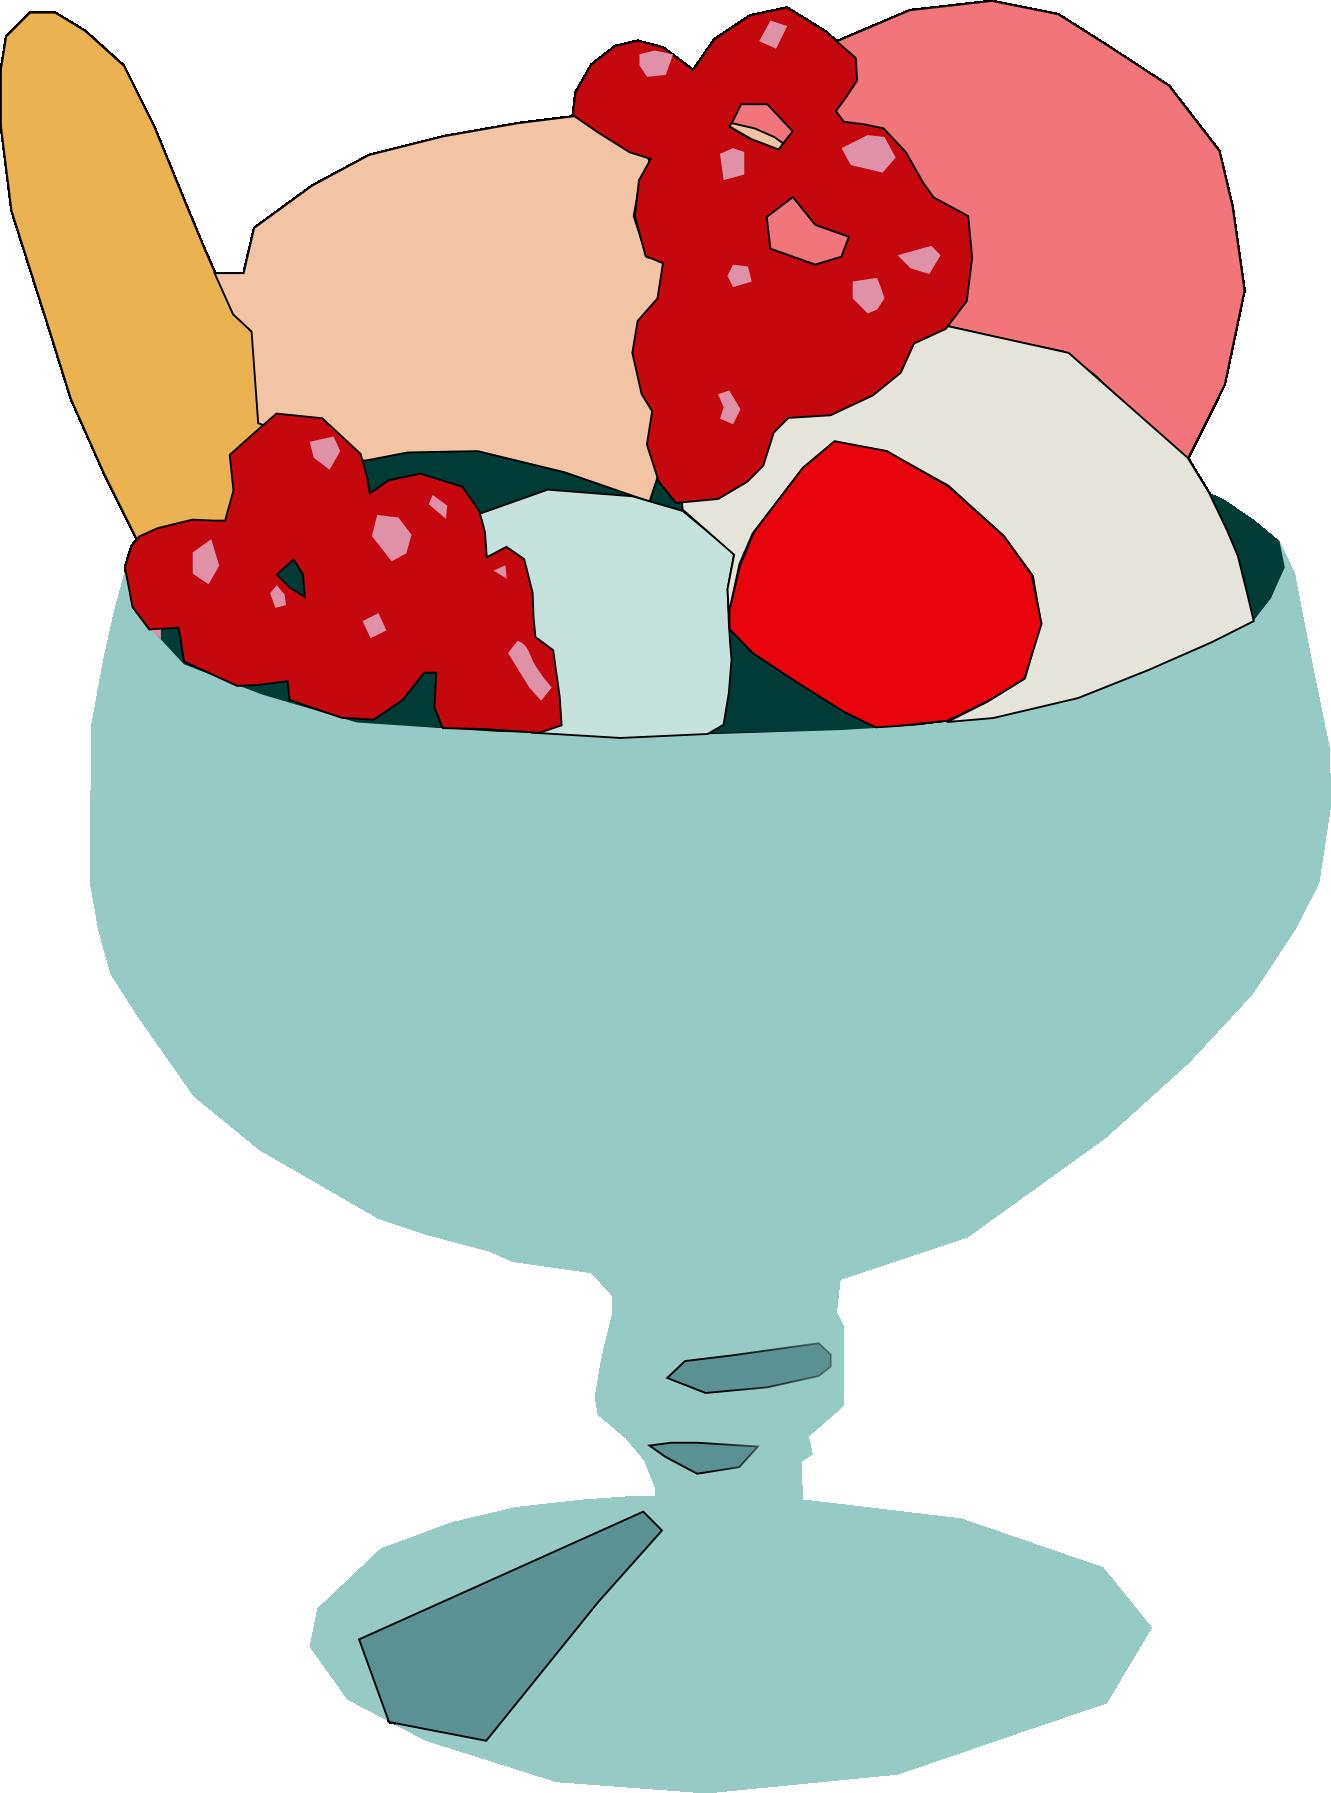 Yogurt clipart animated. Ice cream cup panda